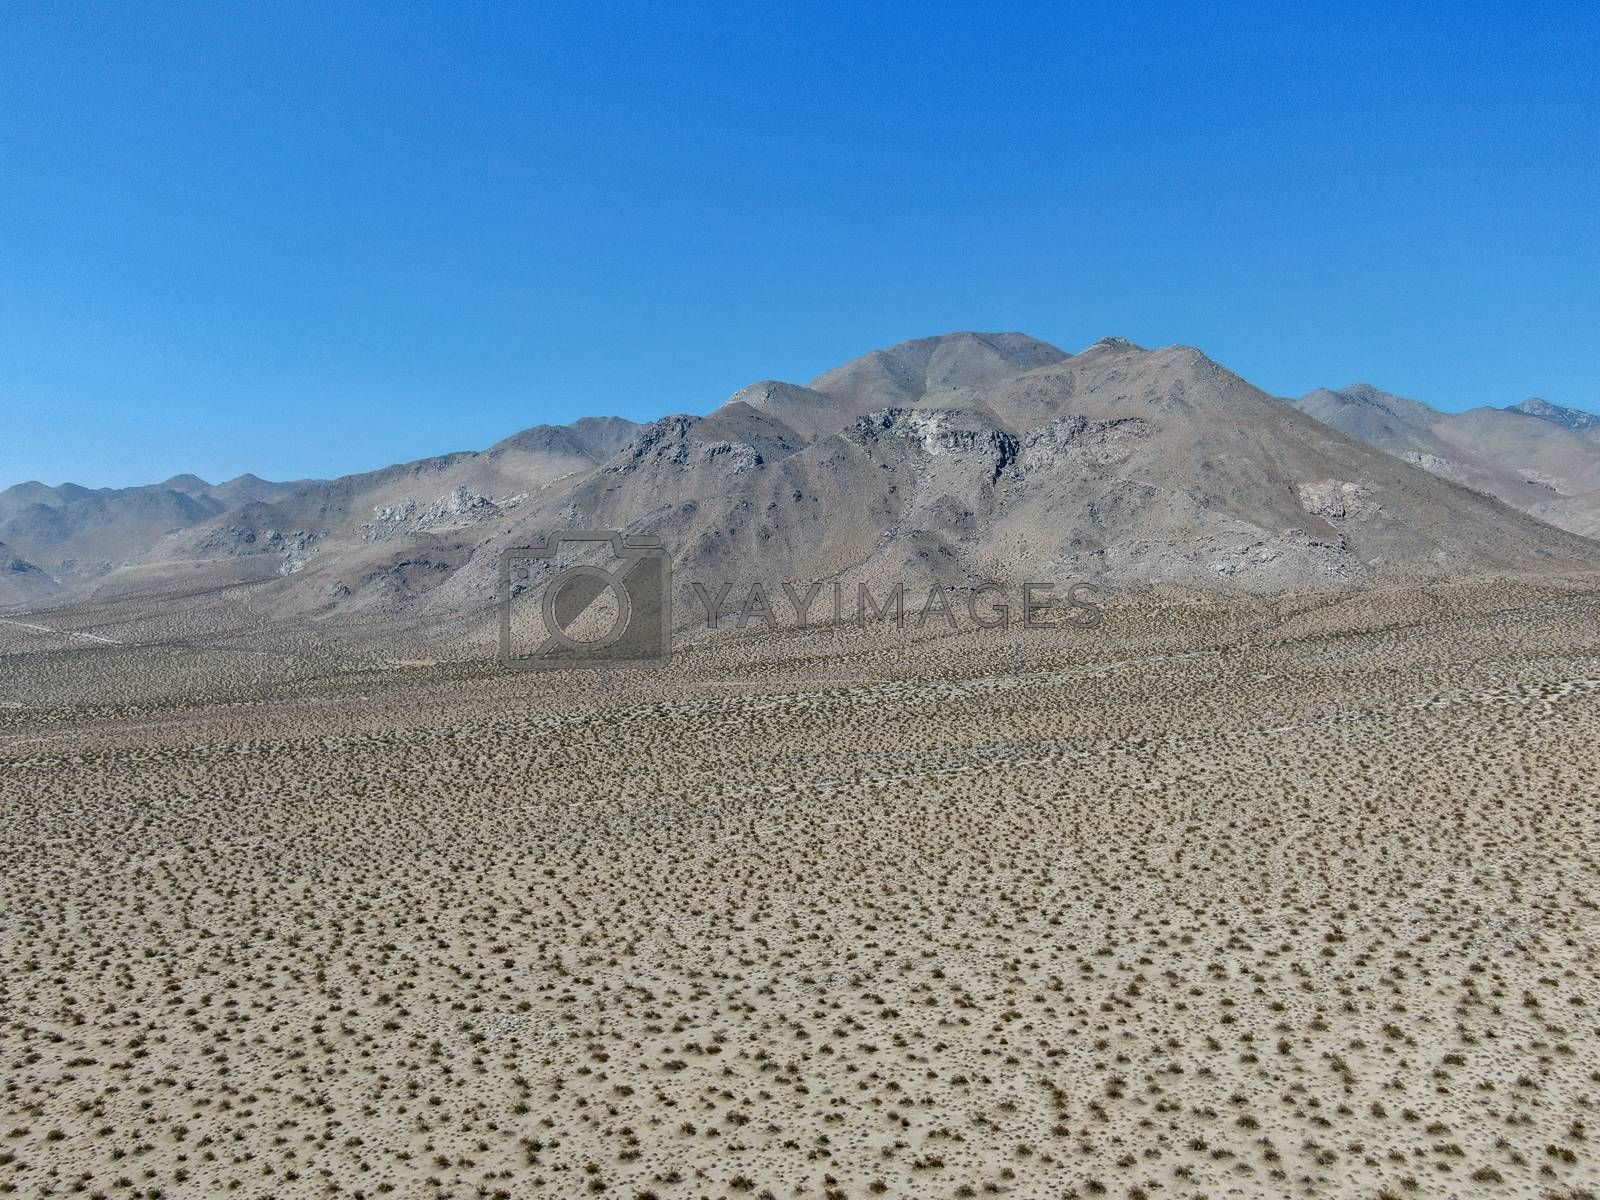 Royalty free image of Aerial view of desert hills under blue sky in California's Mojave desert, near Ridgecrest.  by Bonandbon